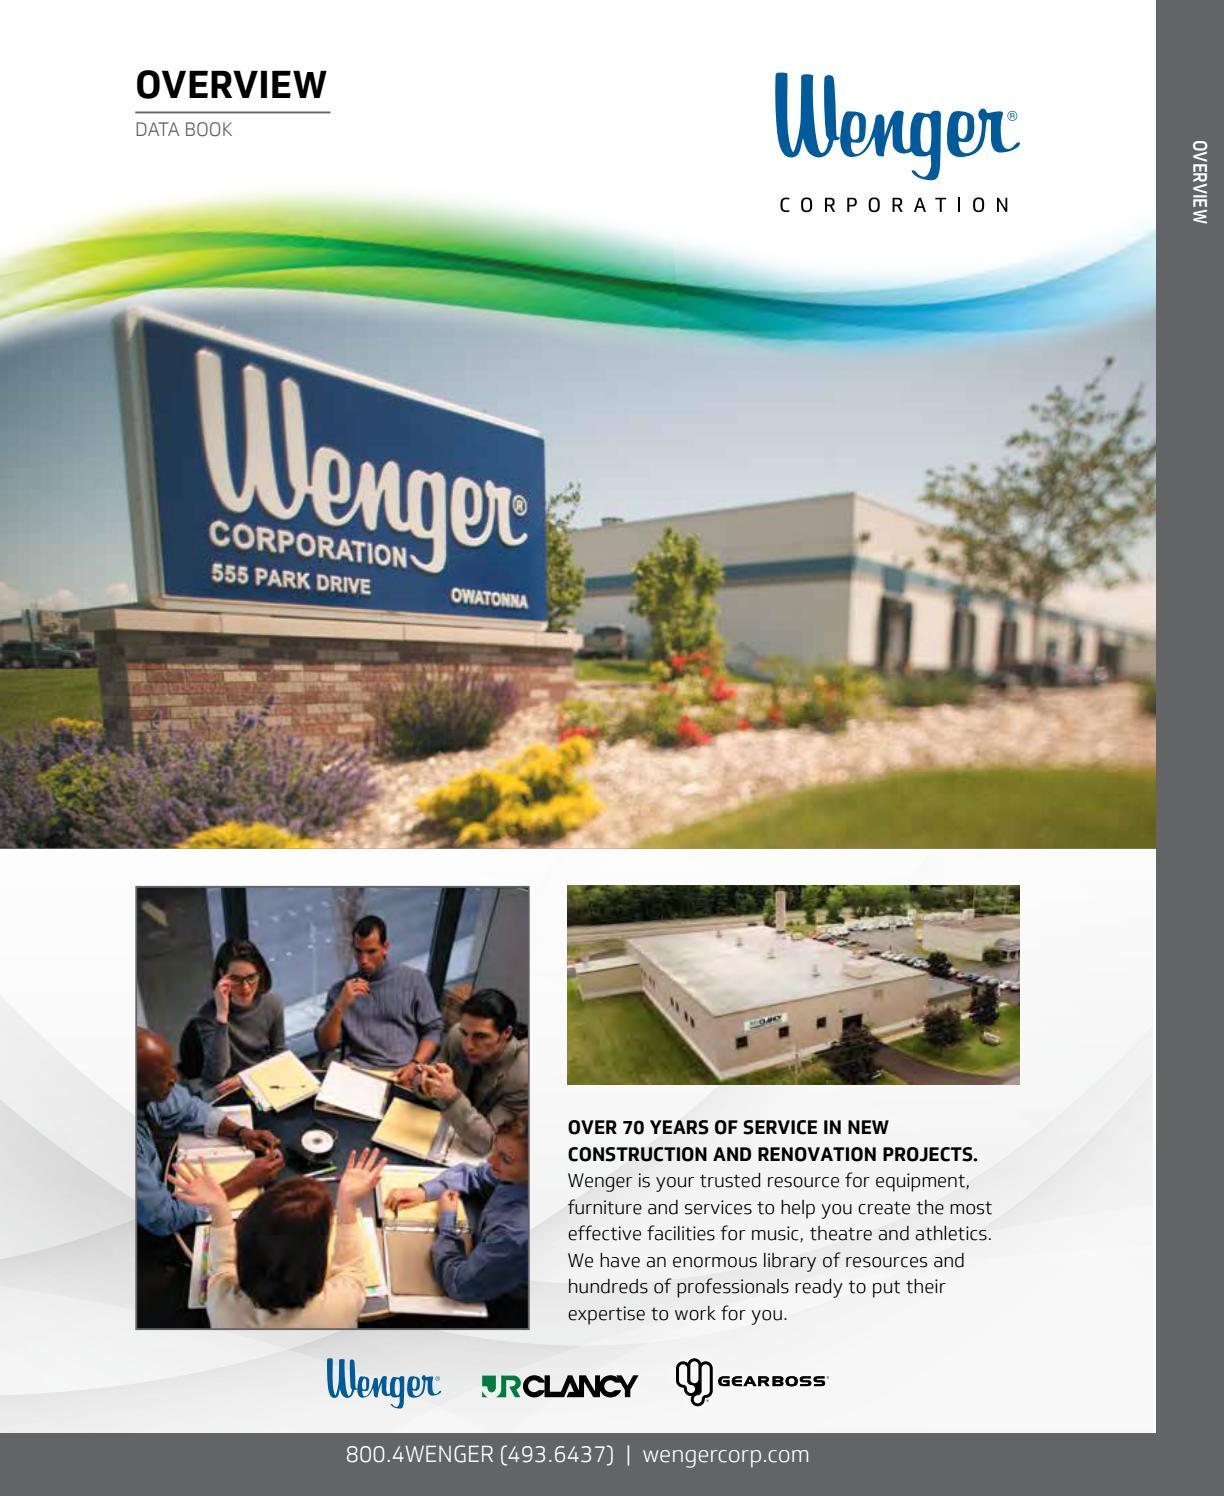 dfcbdcb068270 Wenger Data Book by Wenger Corporation - issuu